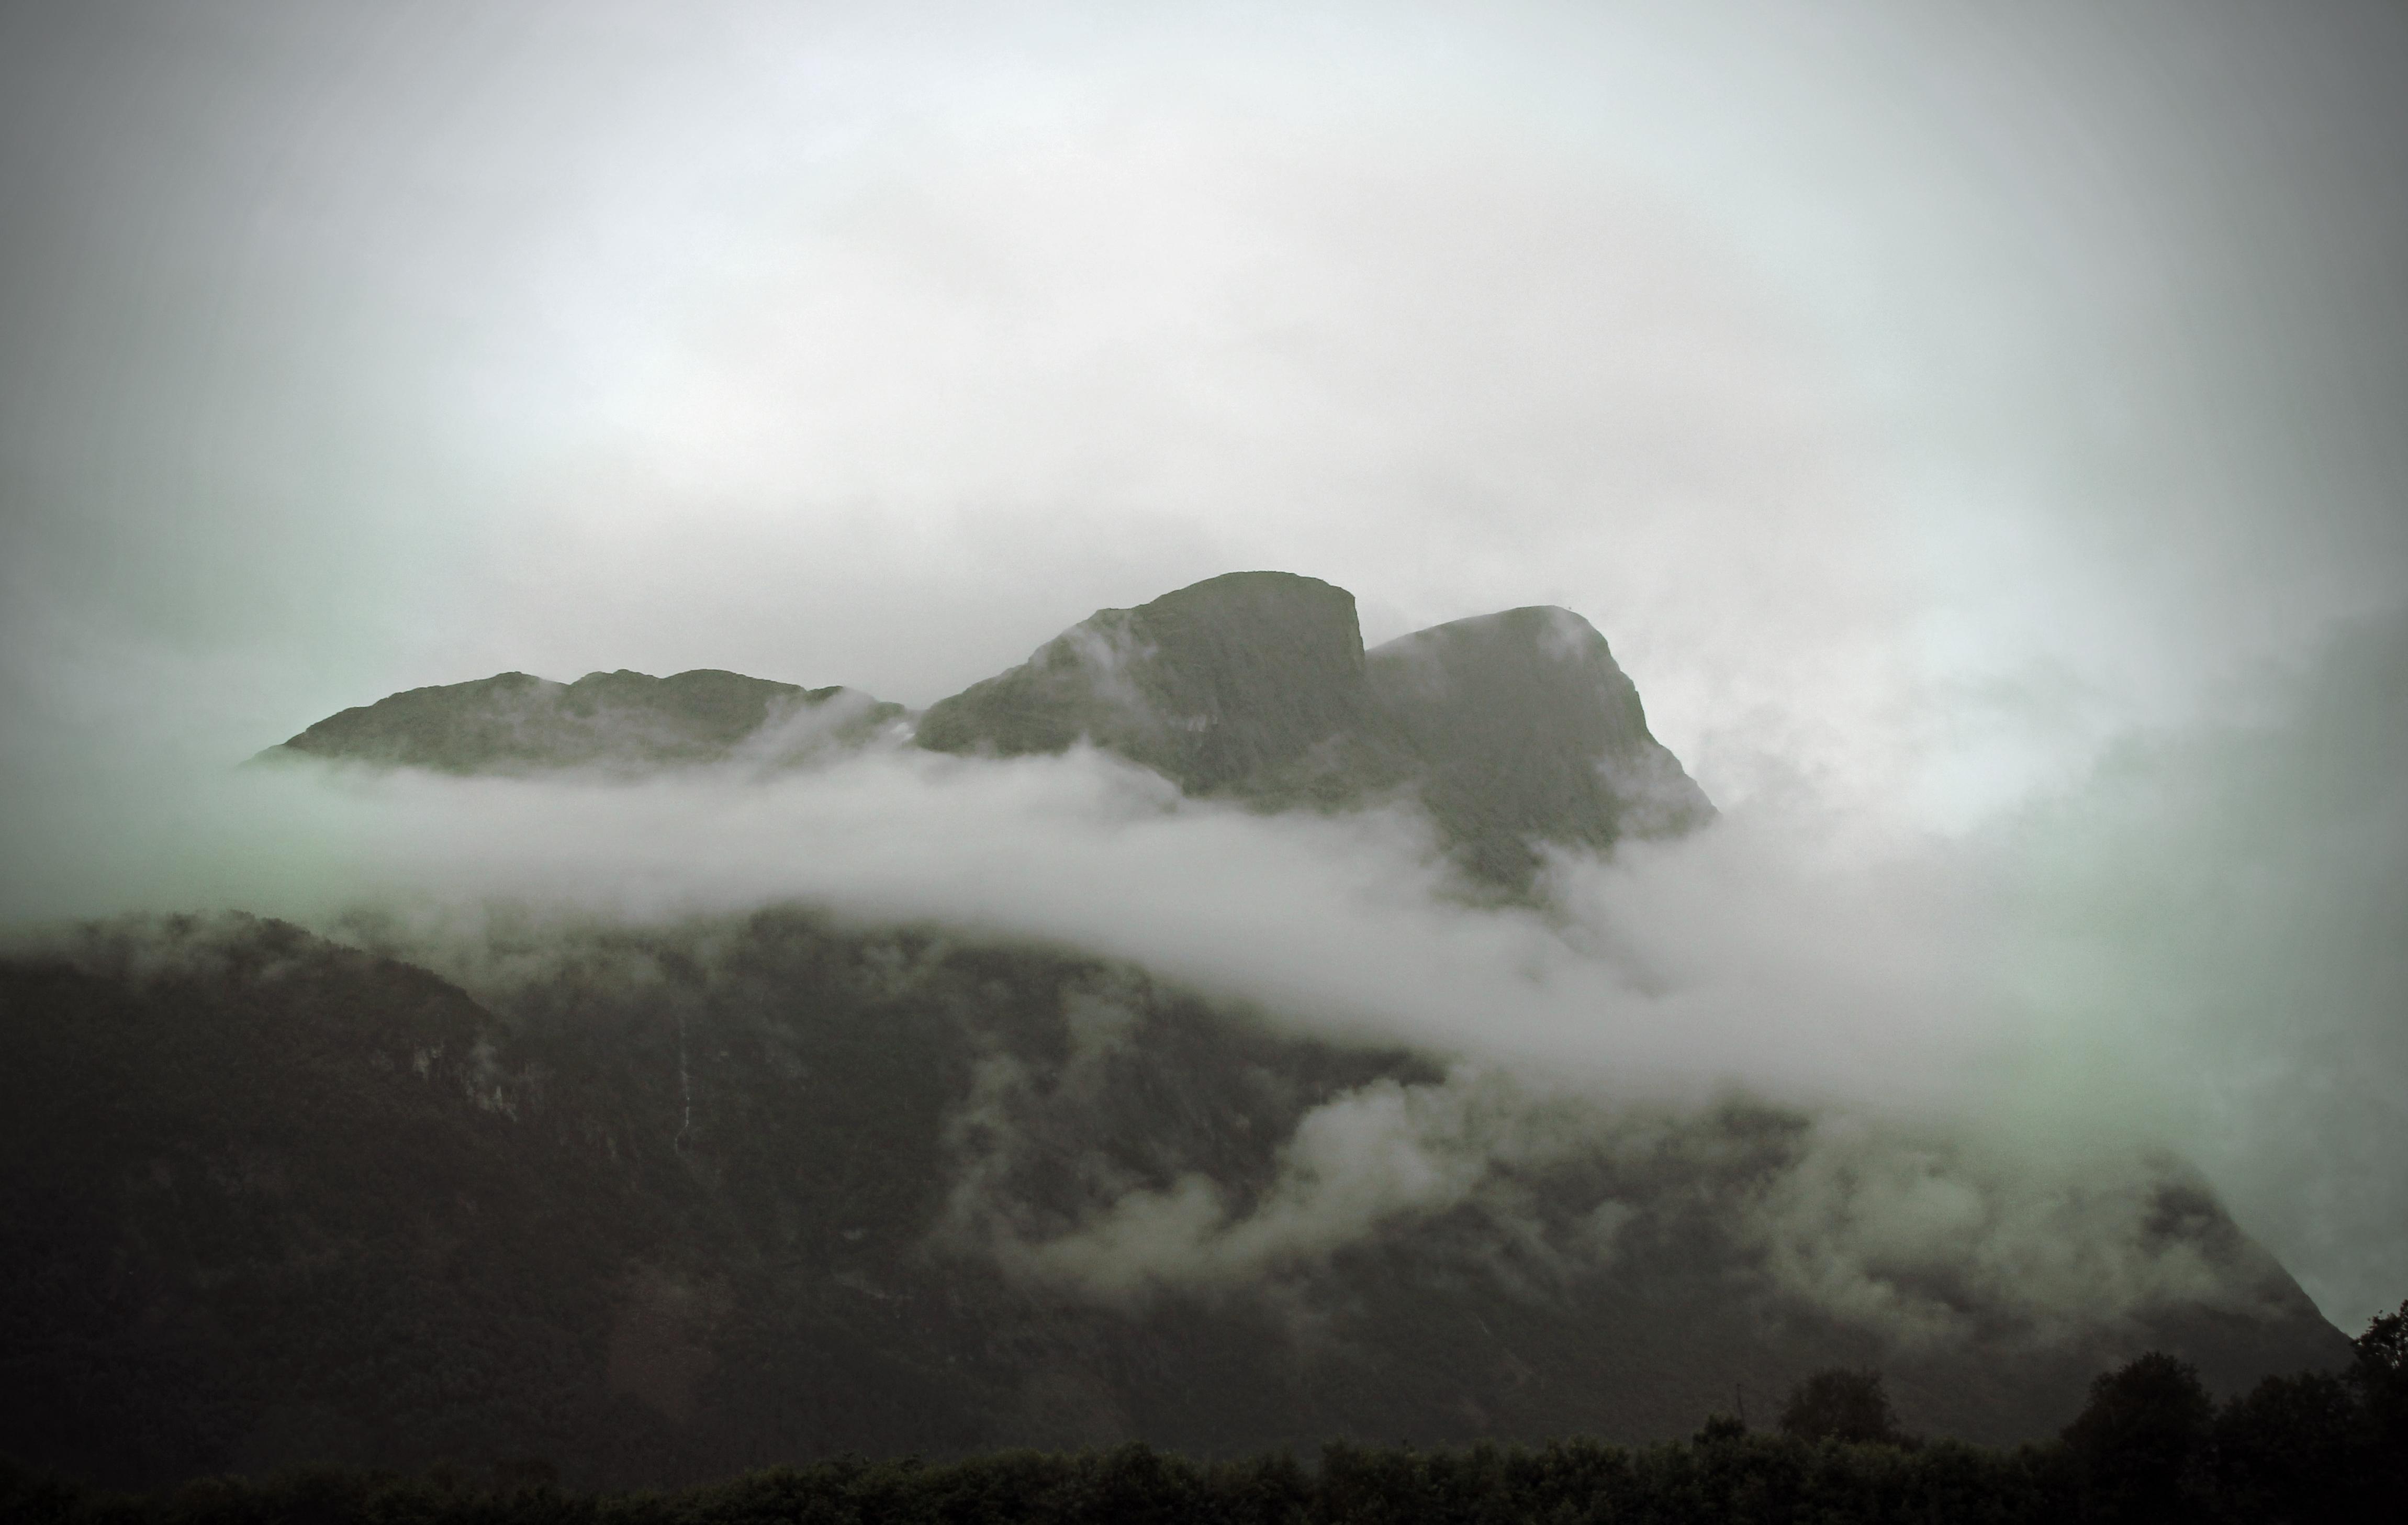 Fog and rain – ingaphotography